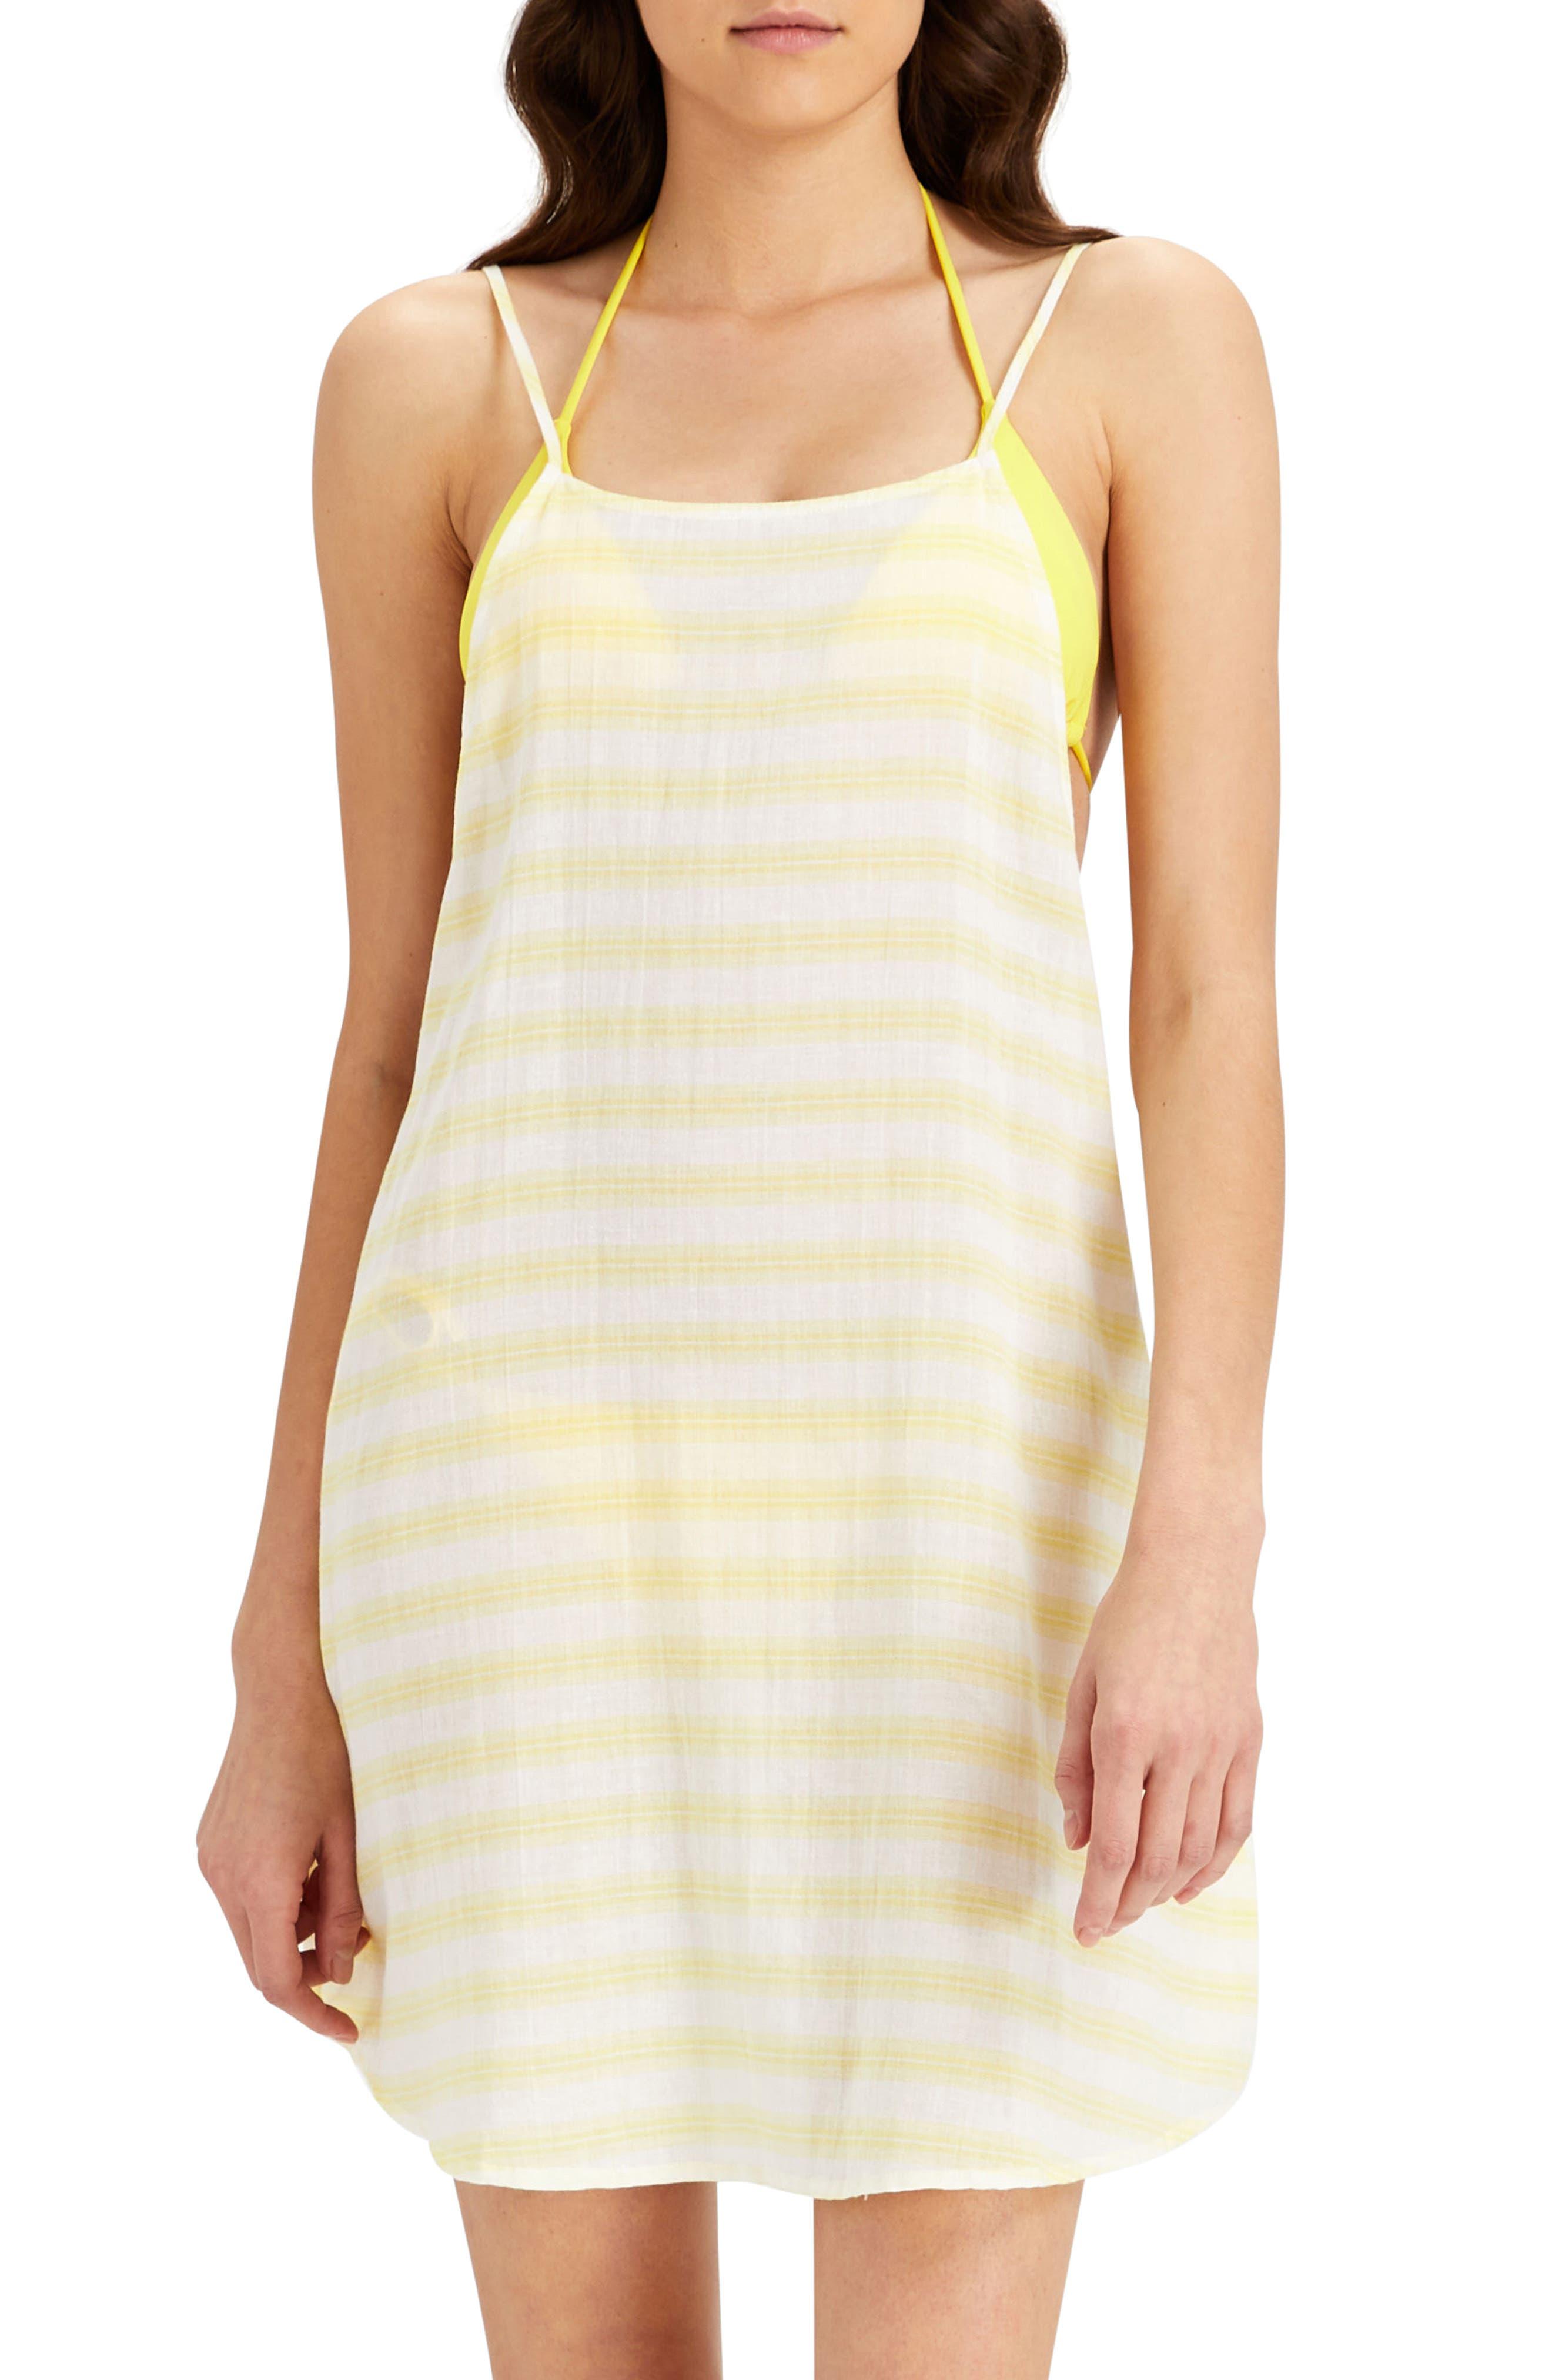 Sasha Cover-Up Shirtdress,                         Main,                         color, Citrus/ White